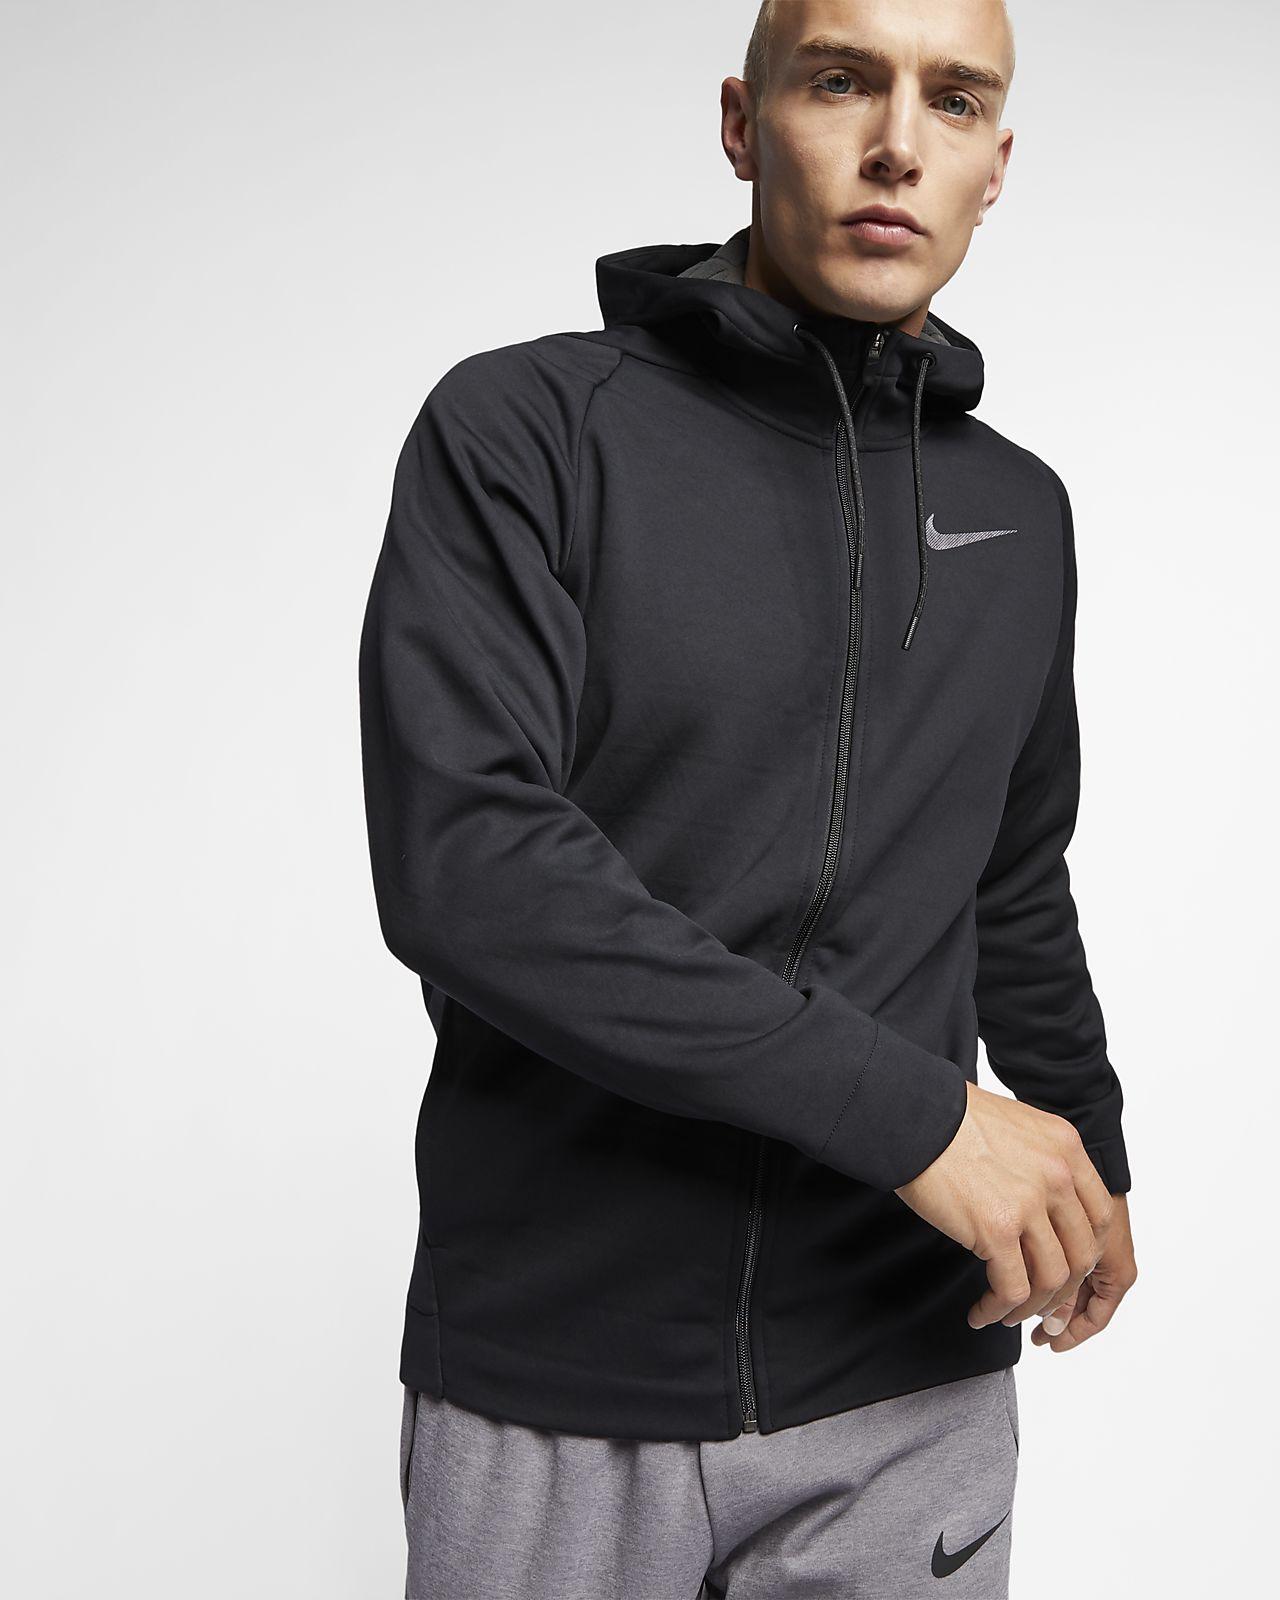 Nike Therma Men's Hooded Full Zip Training Jacket